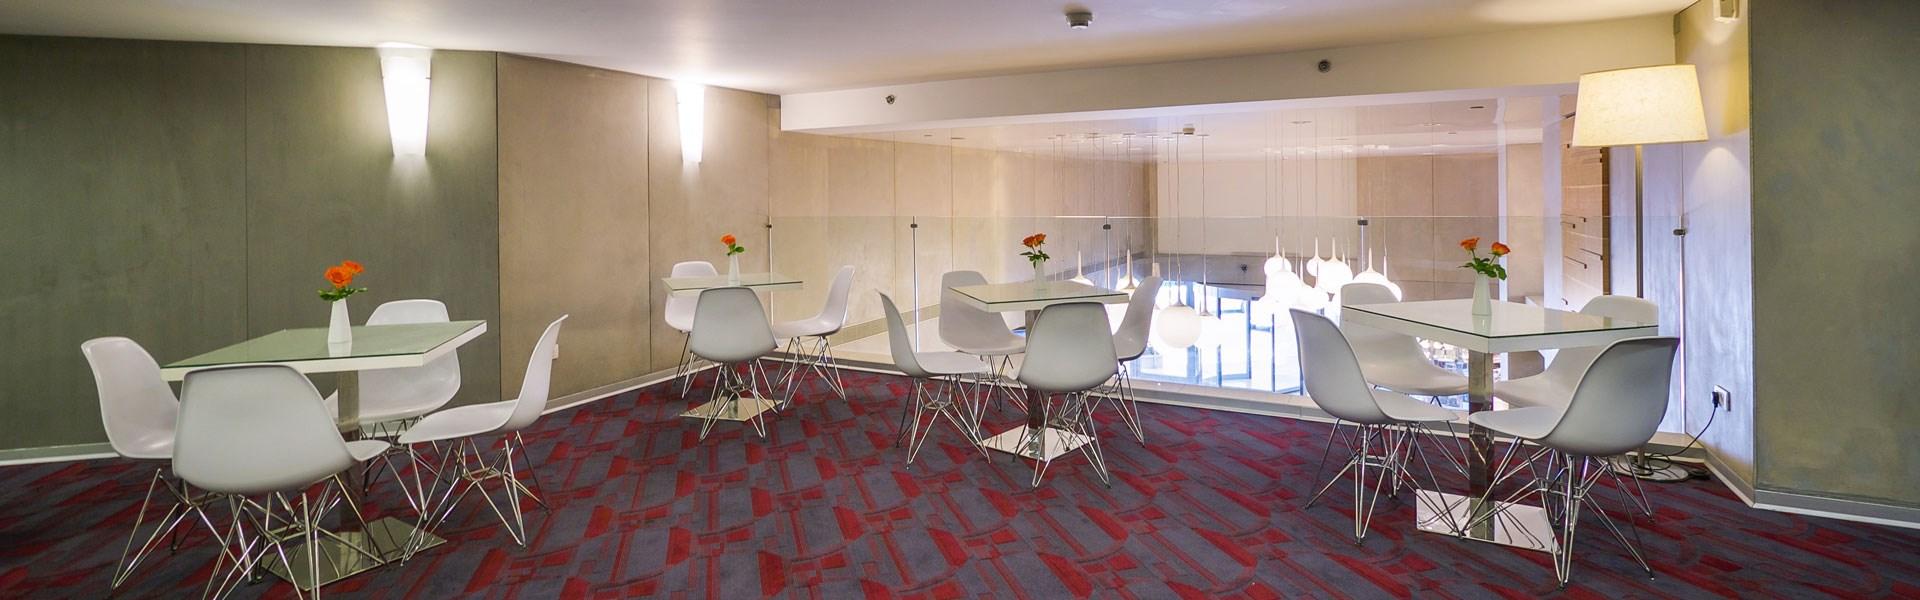 Conference rooms - Metropolitan Hotel